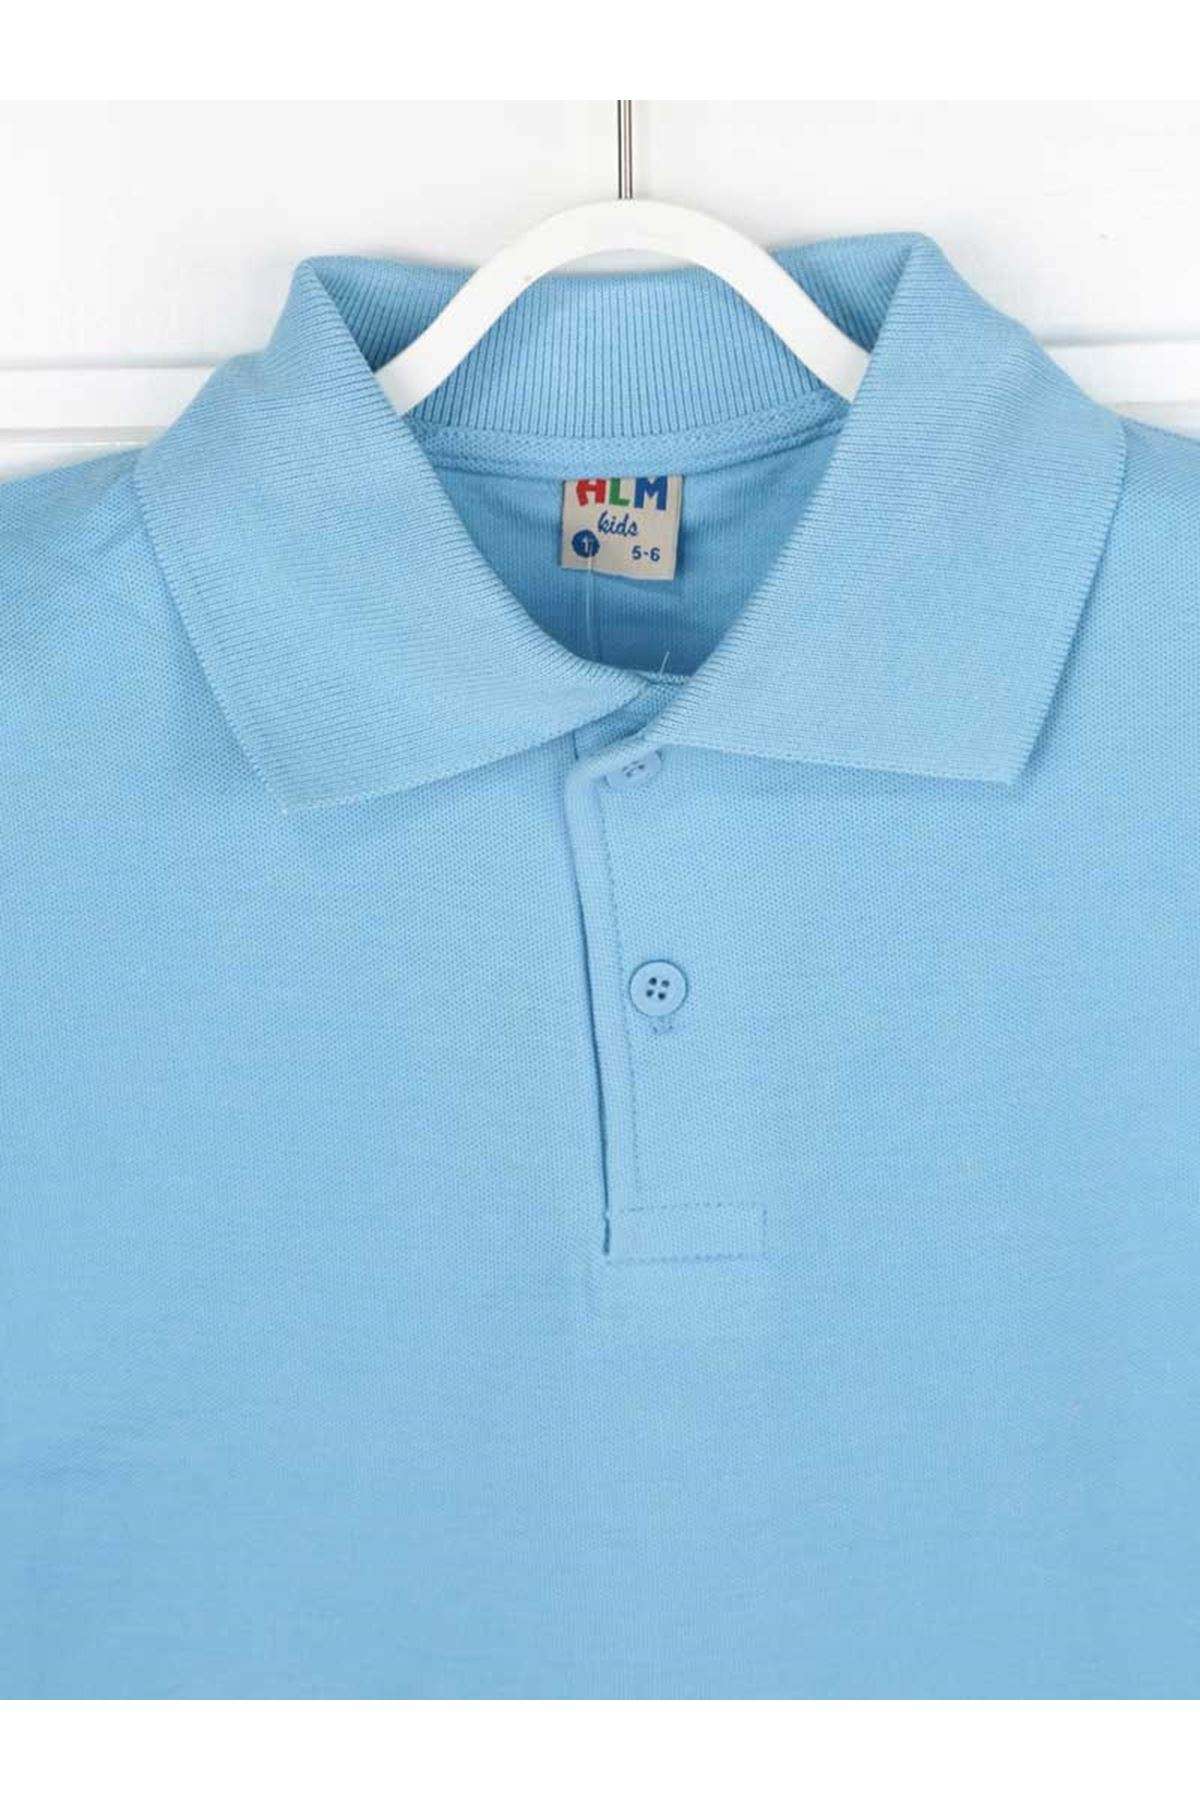 Mavi Polo Yaka Pamuklu Çocuk Basic Tişört